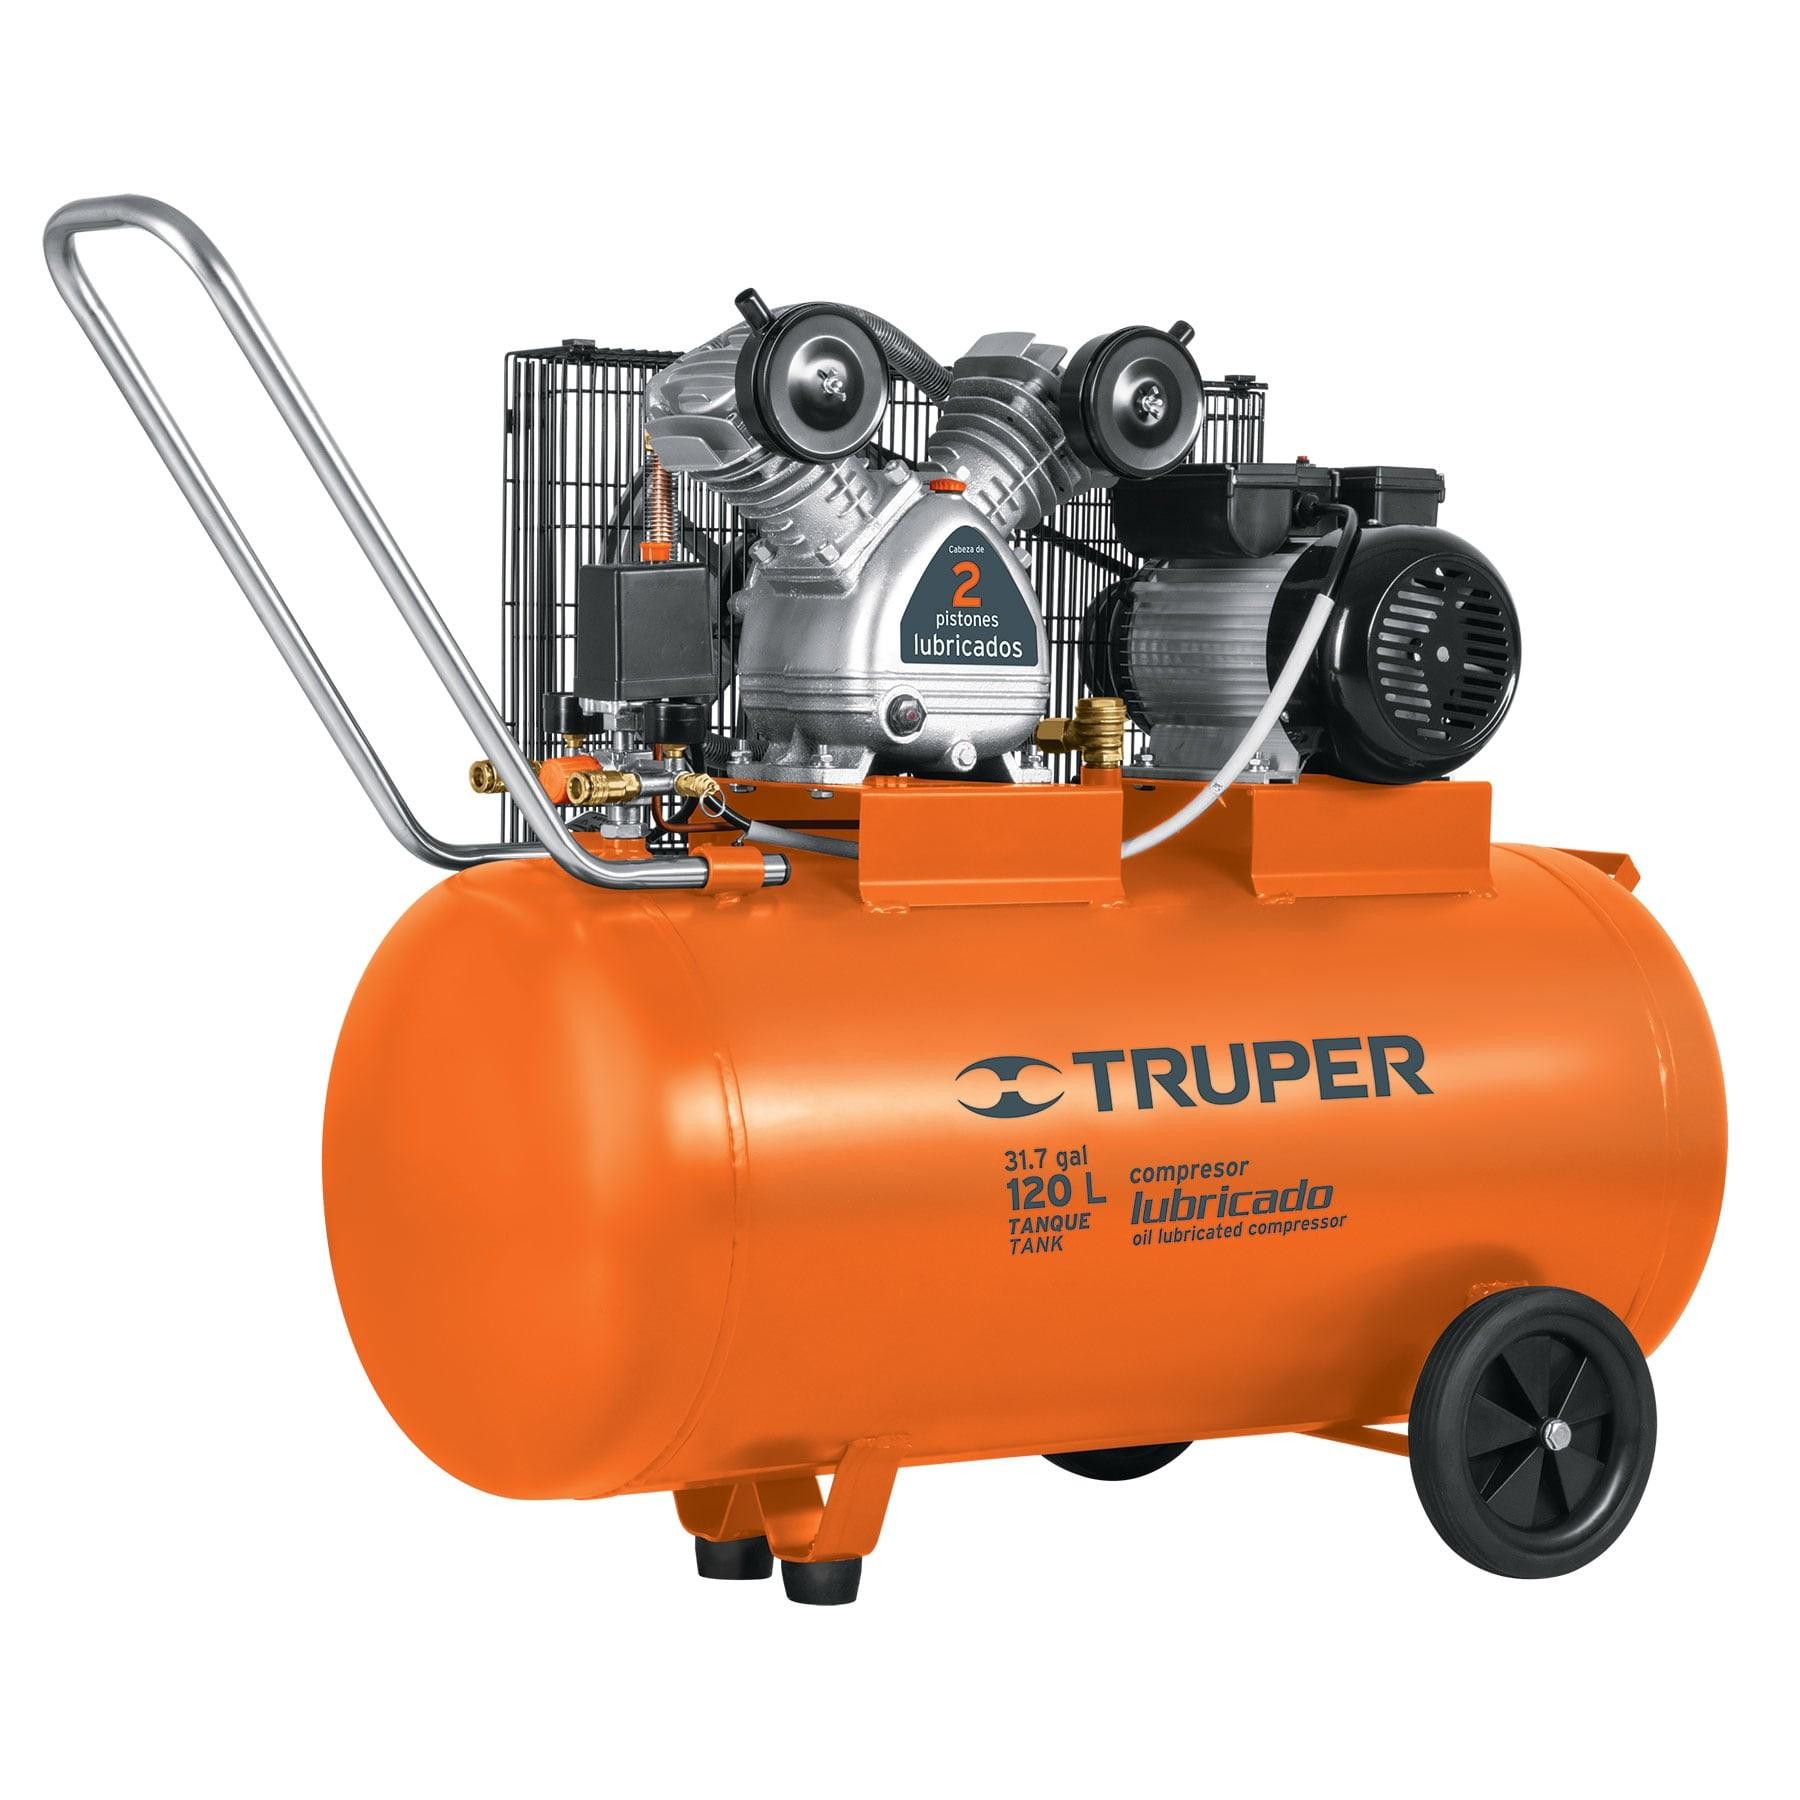 Compresor horizontal 120 L, 4 HP (potencia máxima), 220 V